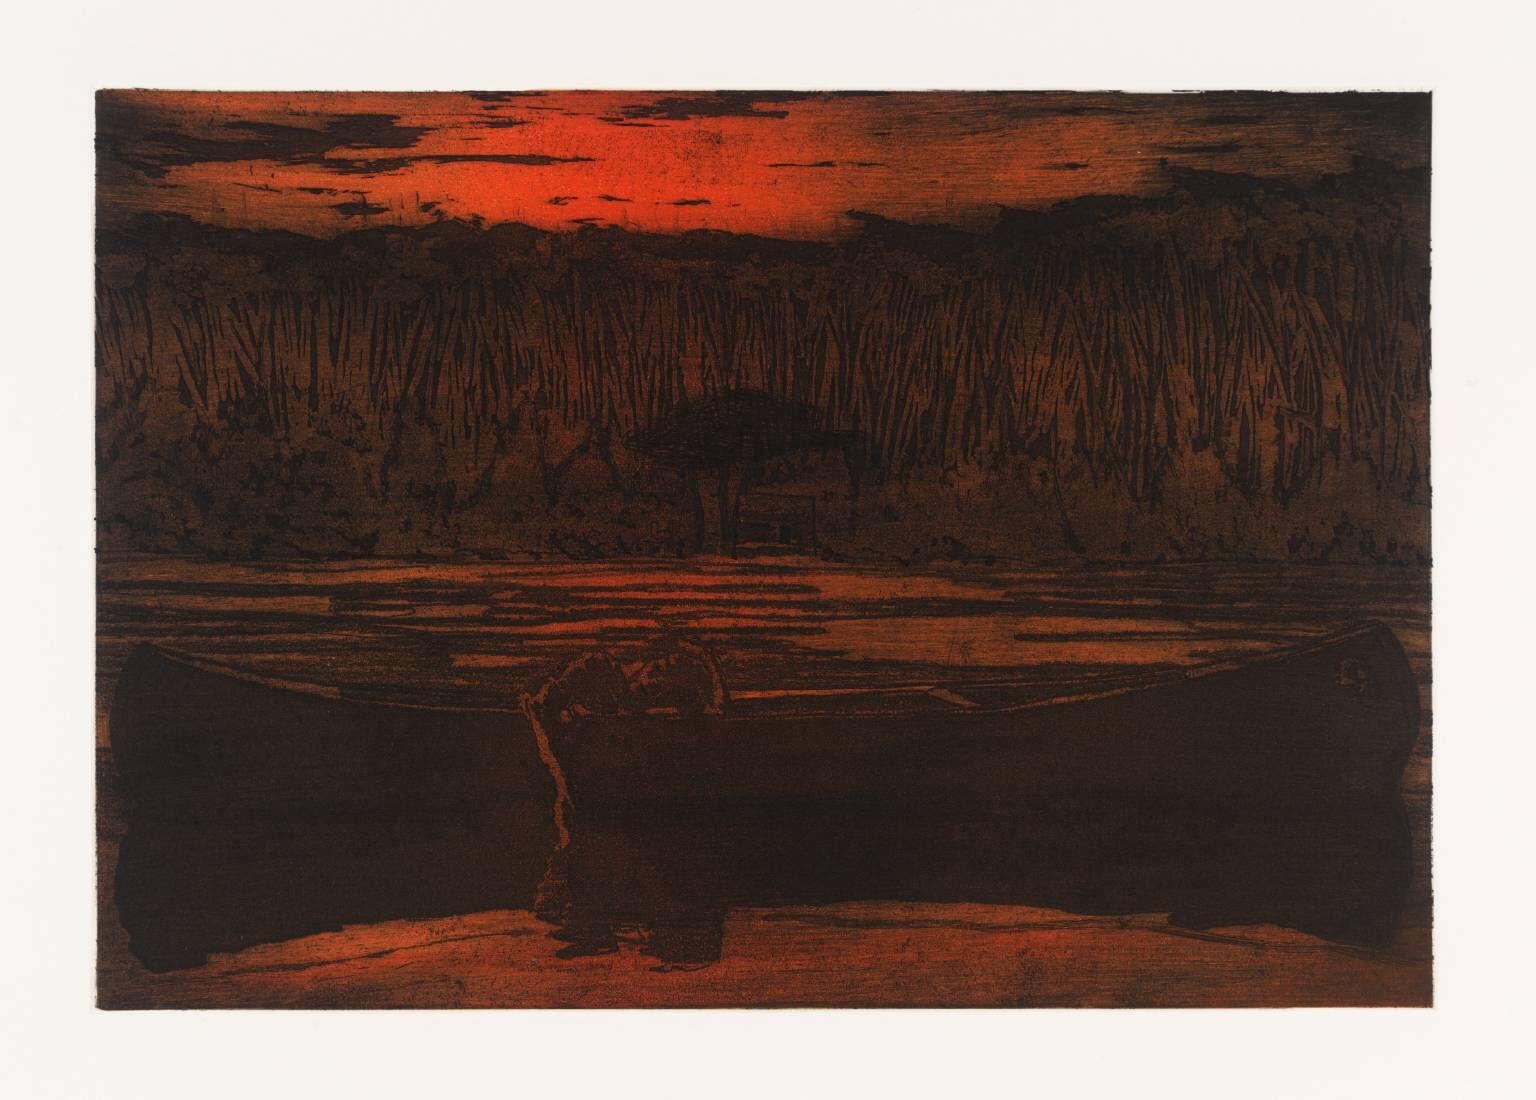 Canoe Lake by Peter Doig